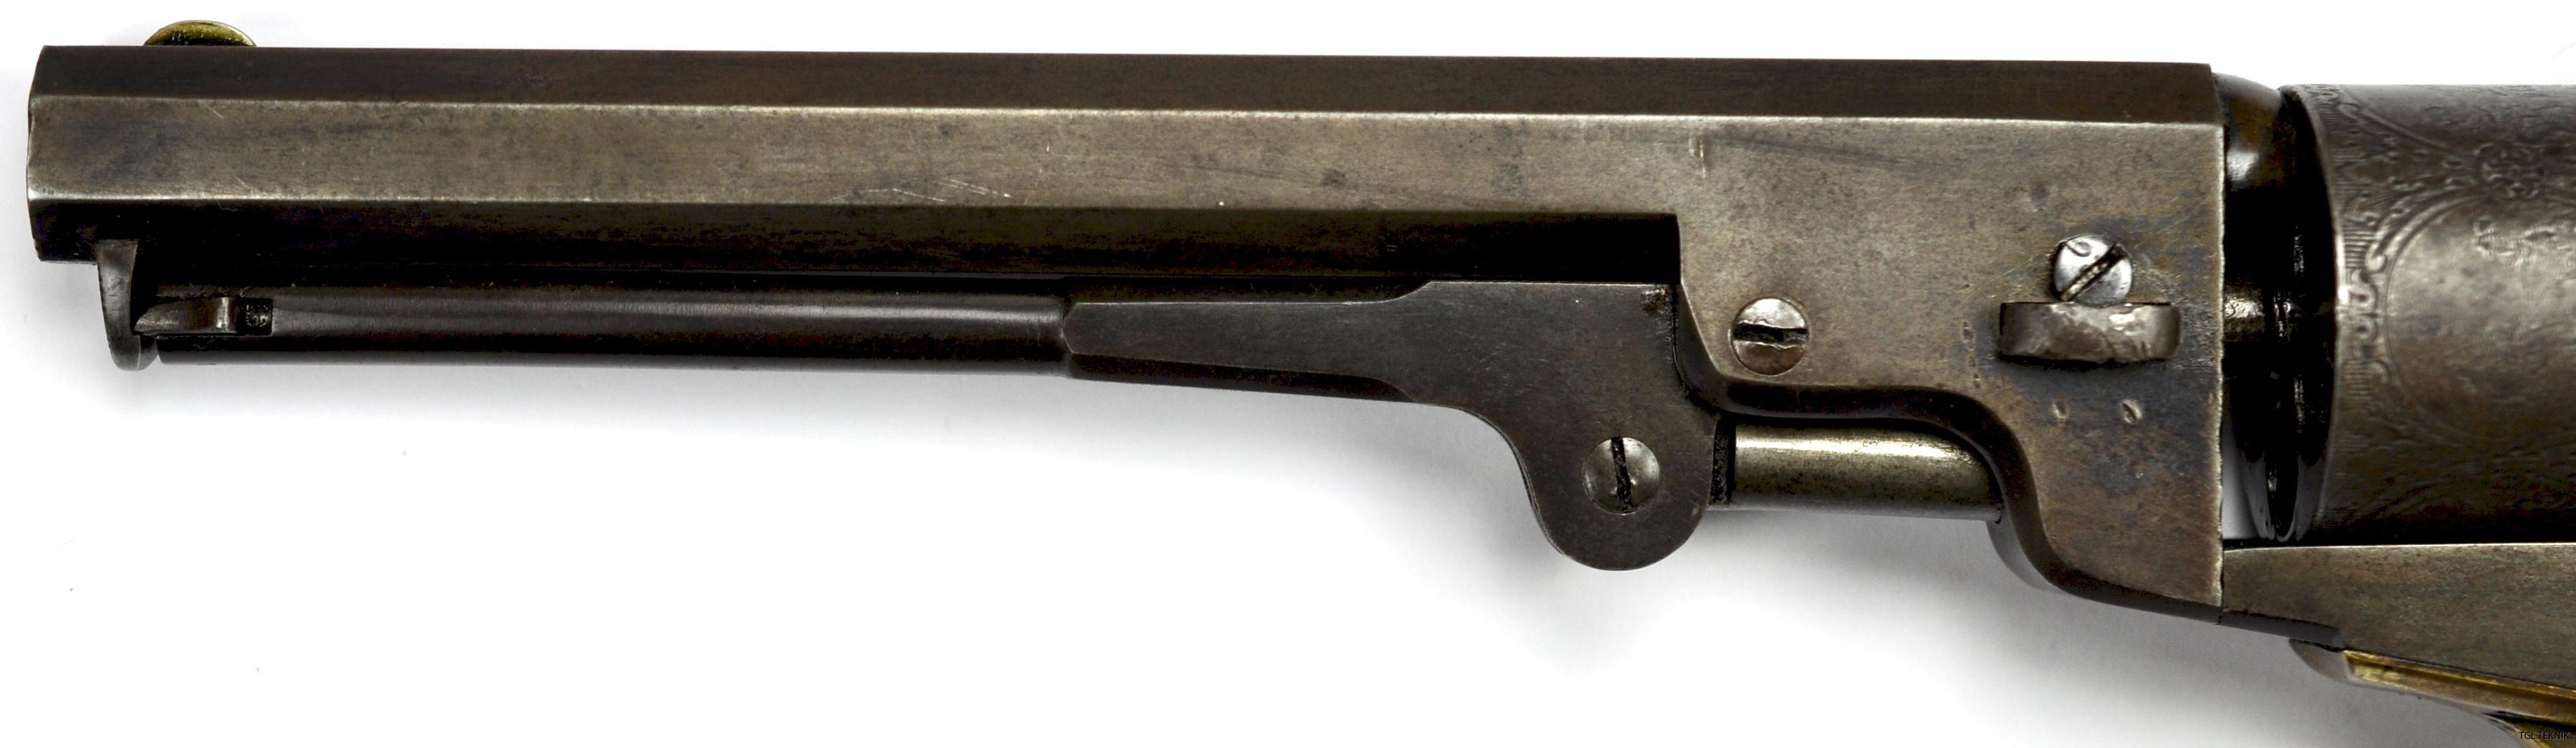 fullsizeoutput_1903